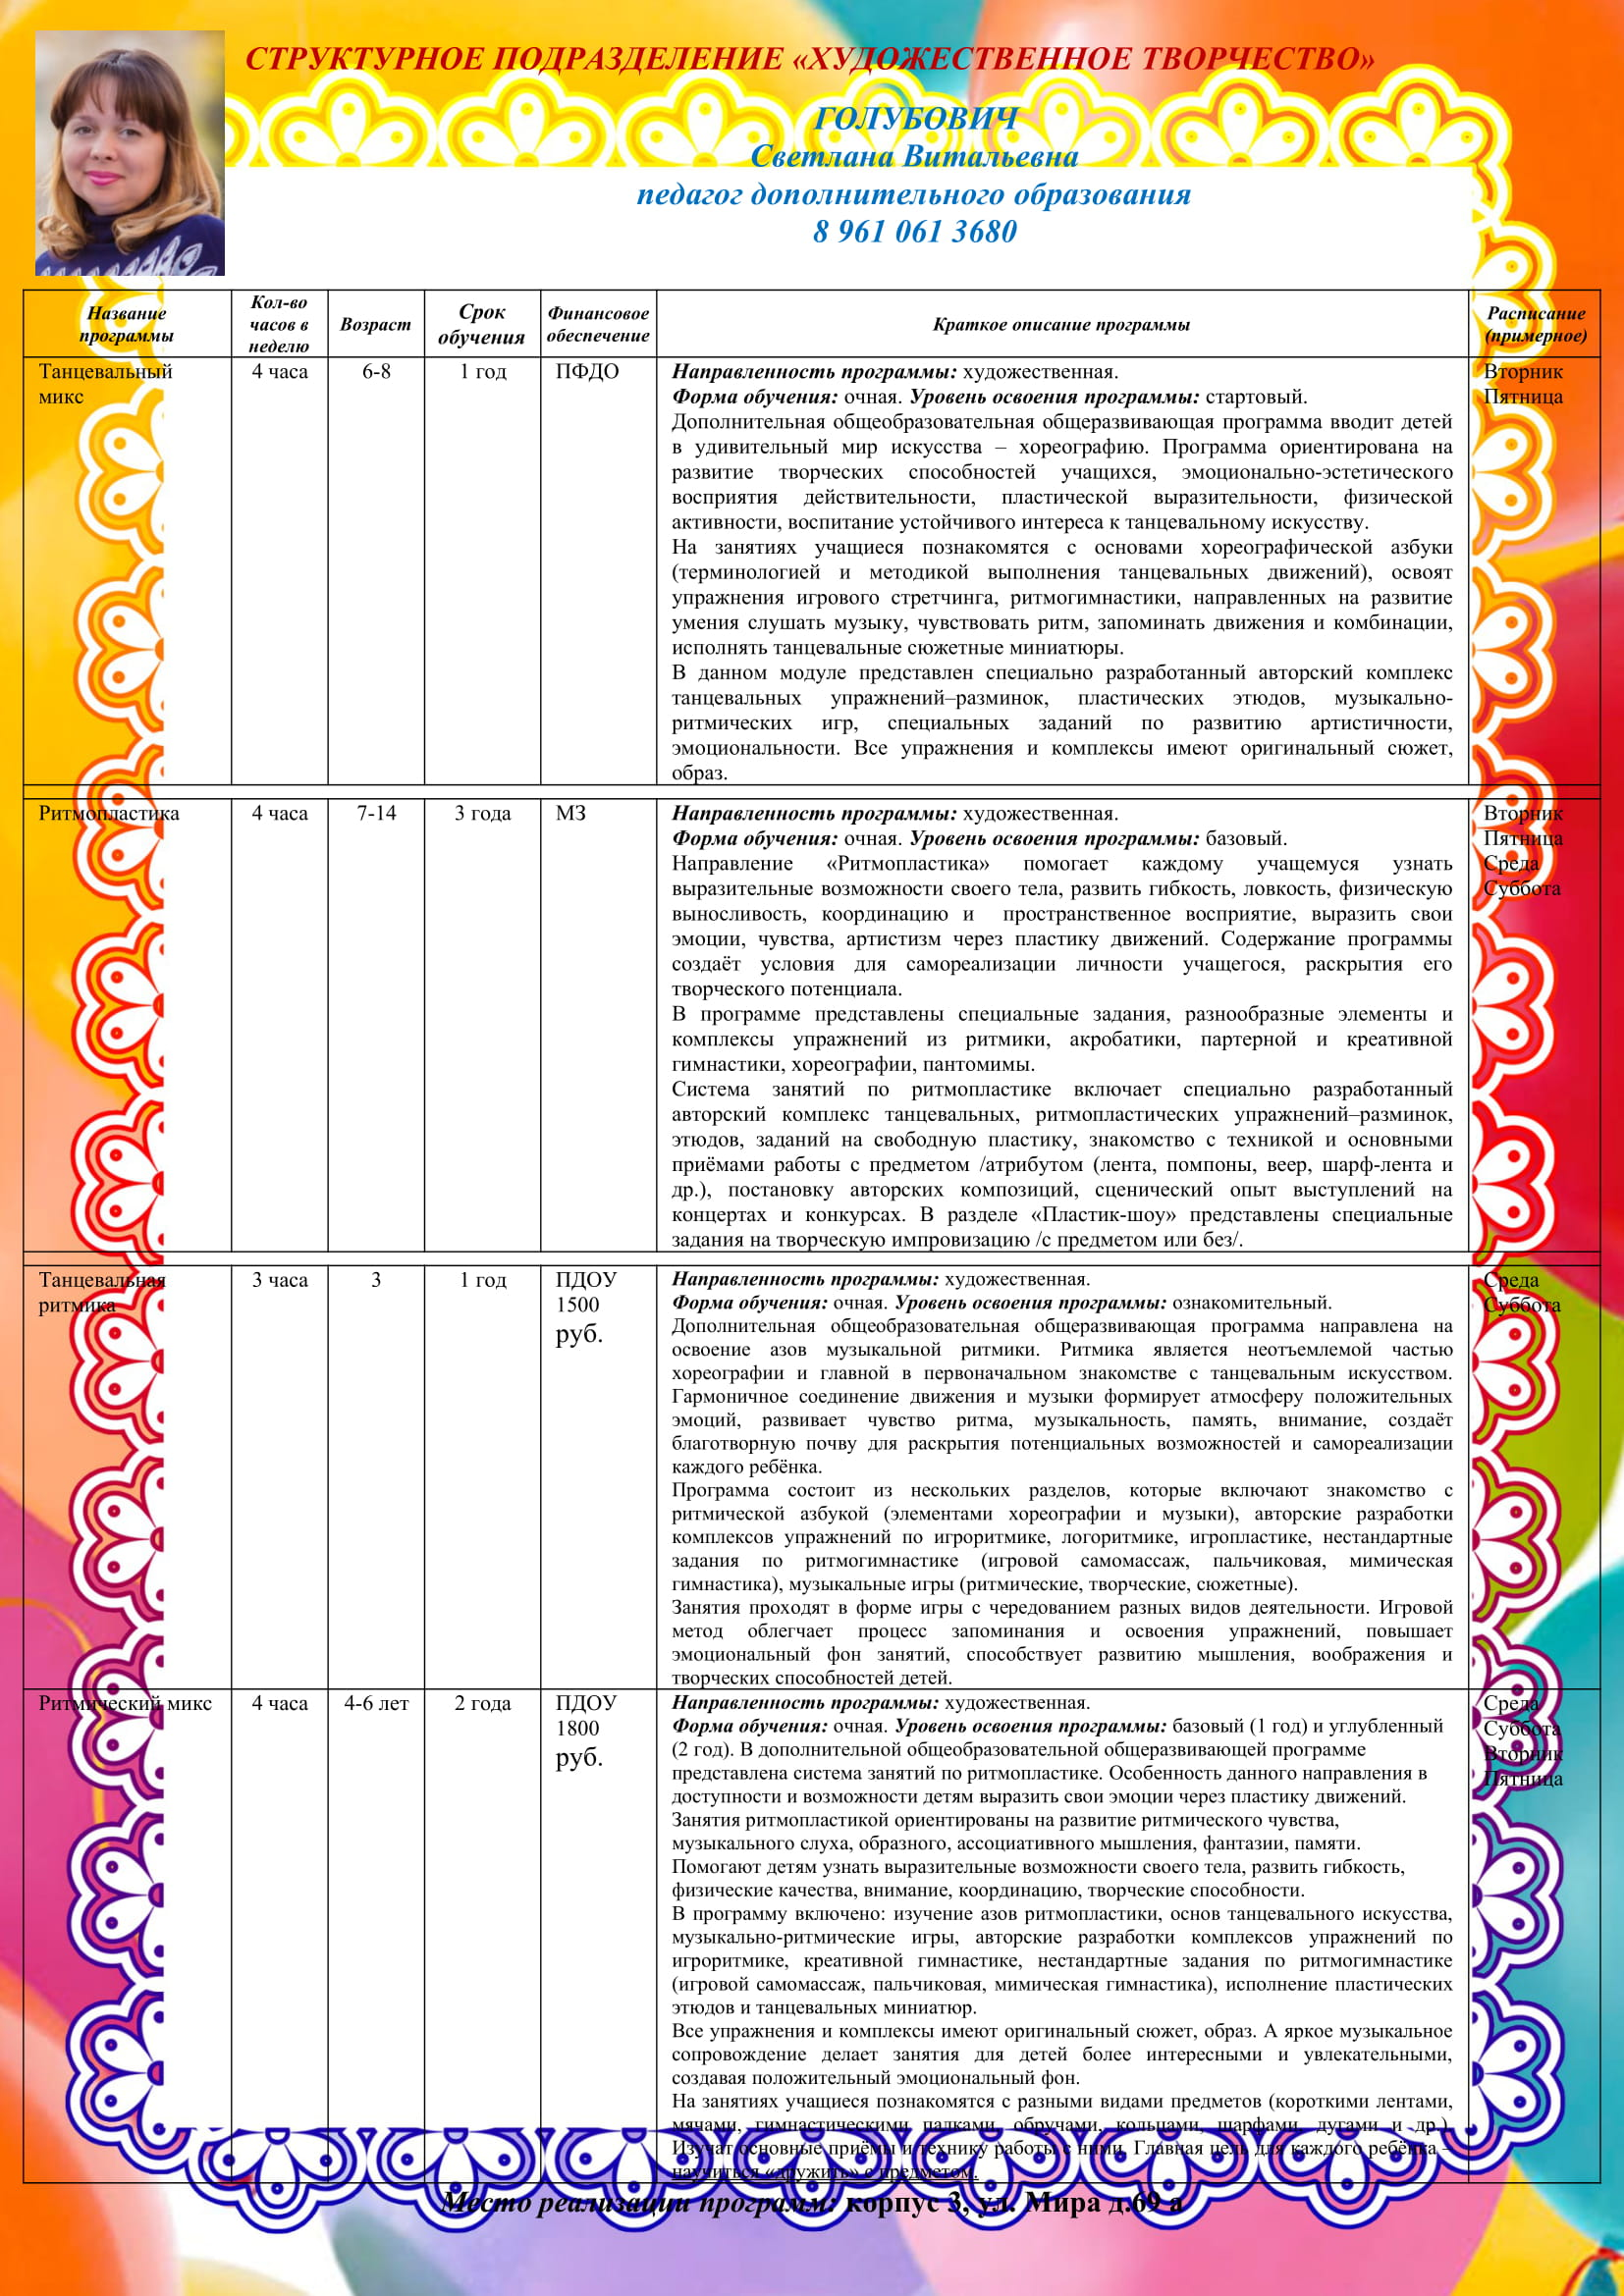 Голубович-1